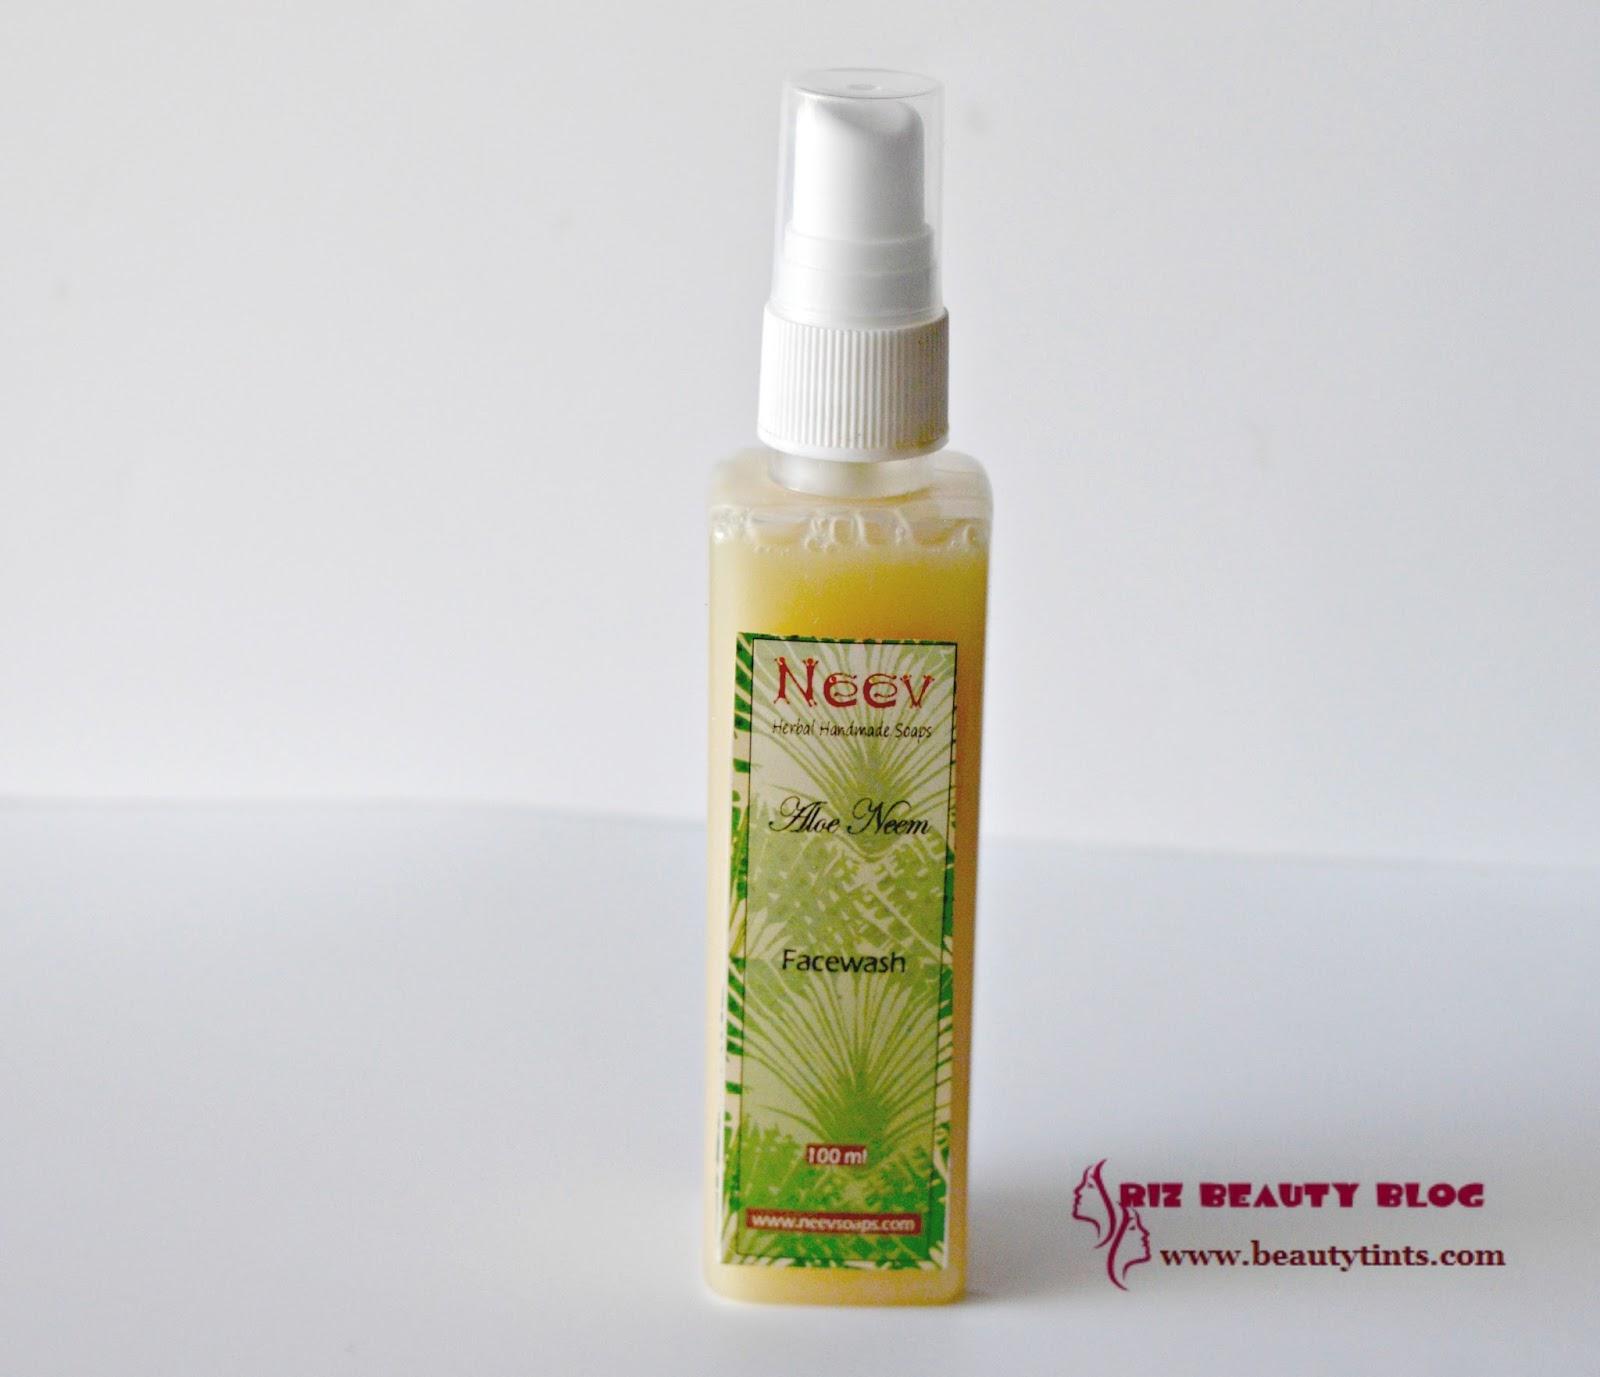 Sriz Beauty Blog  Neev Aloe Neem Face Wash Review!!! 41da4e0abd9